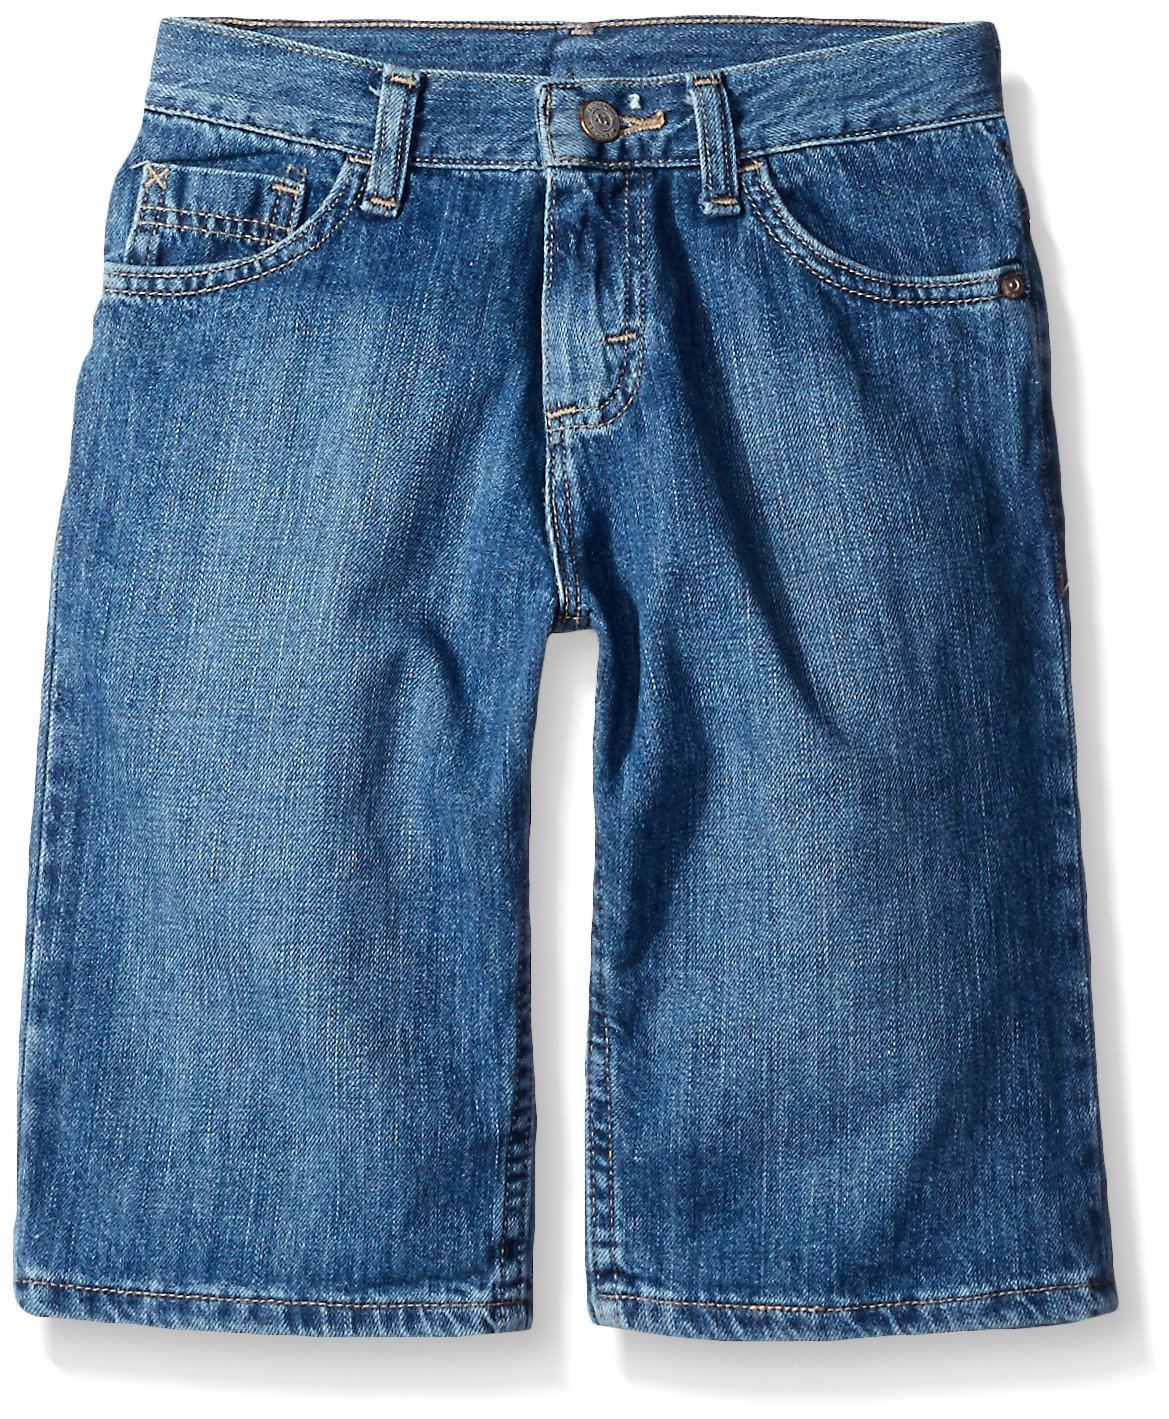 Wrangler Authentics Big Boys' Classic Denim Short, Coastal Wash, 12